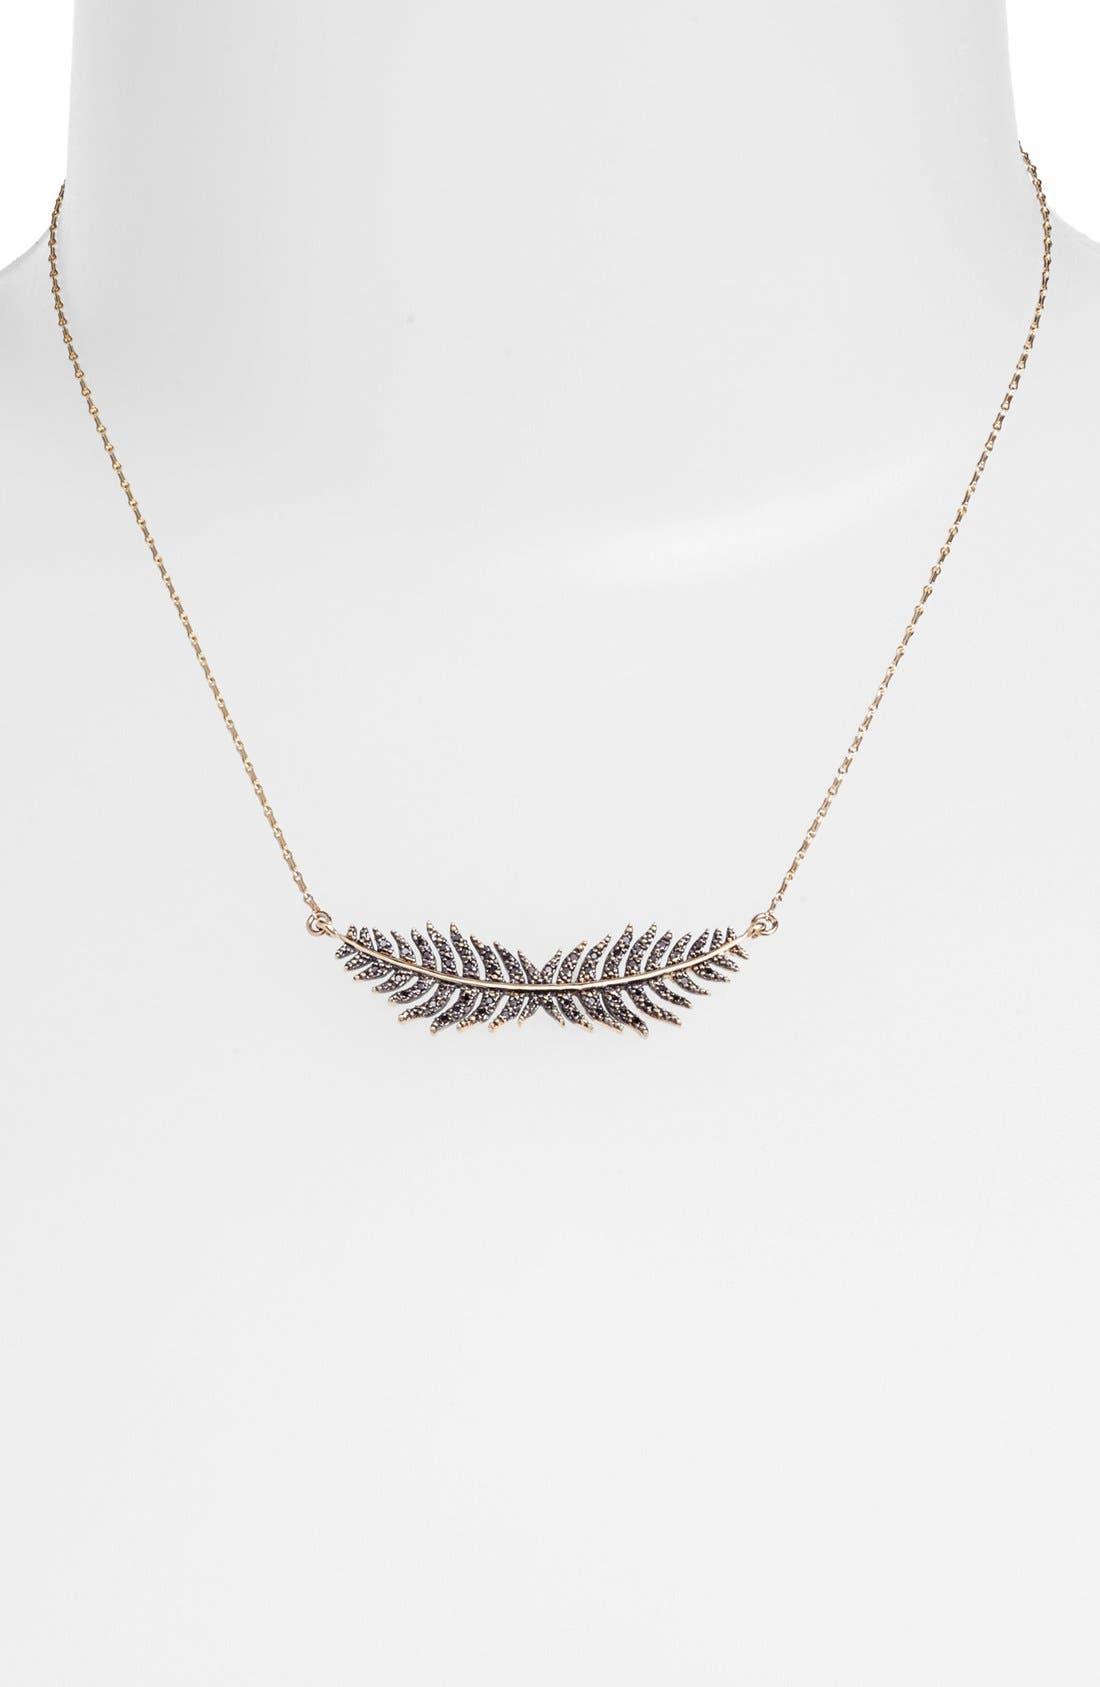 Alternate Image 1 Selected - Mizuki 'Wings of Desire' Black Diamond Feather Pendant Necklace